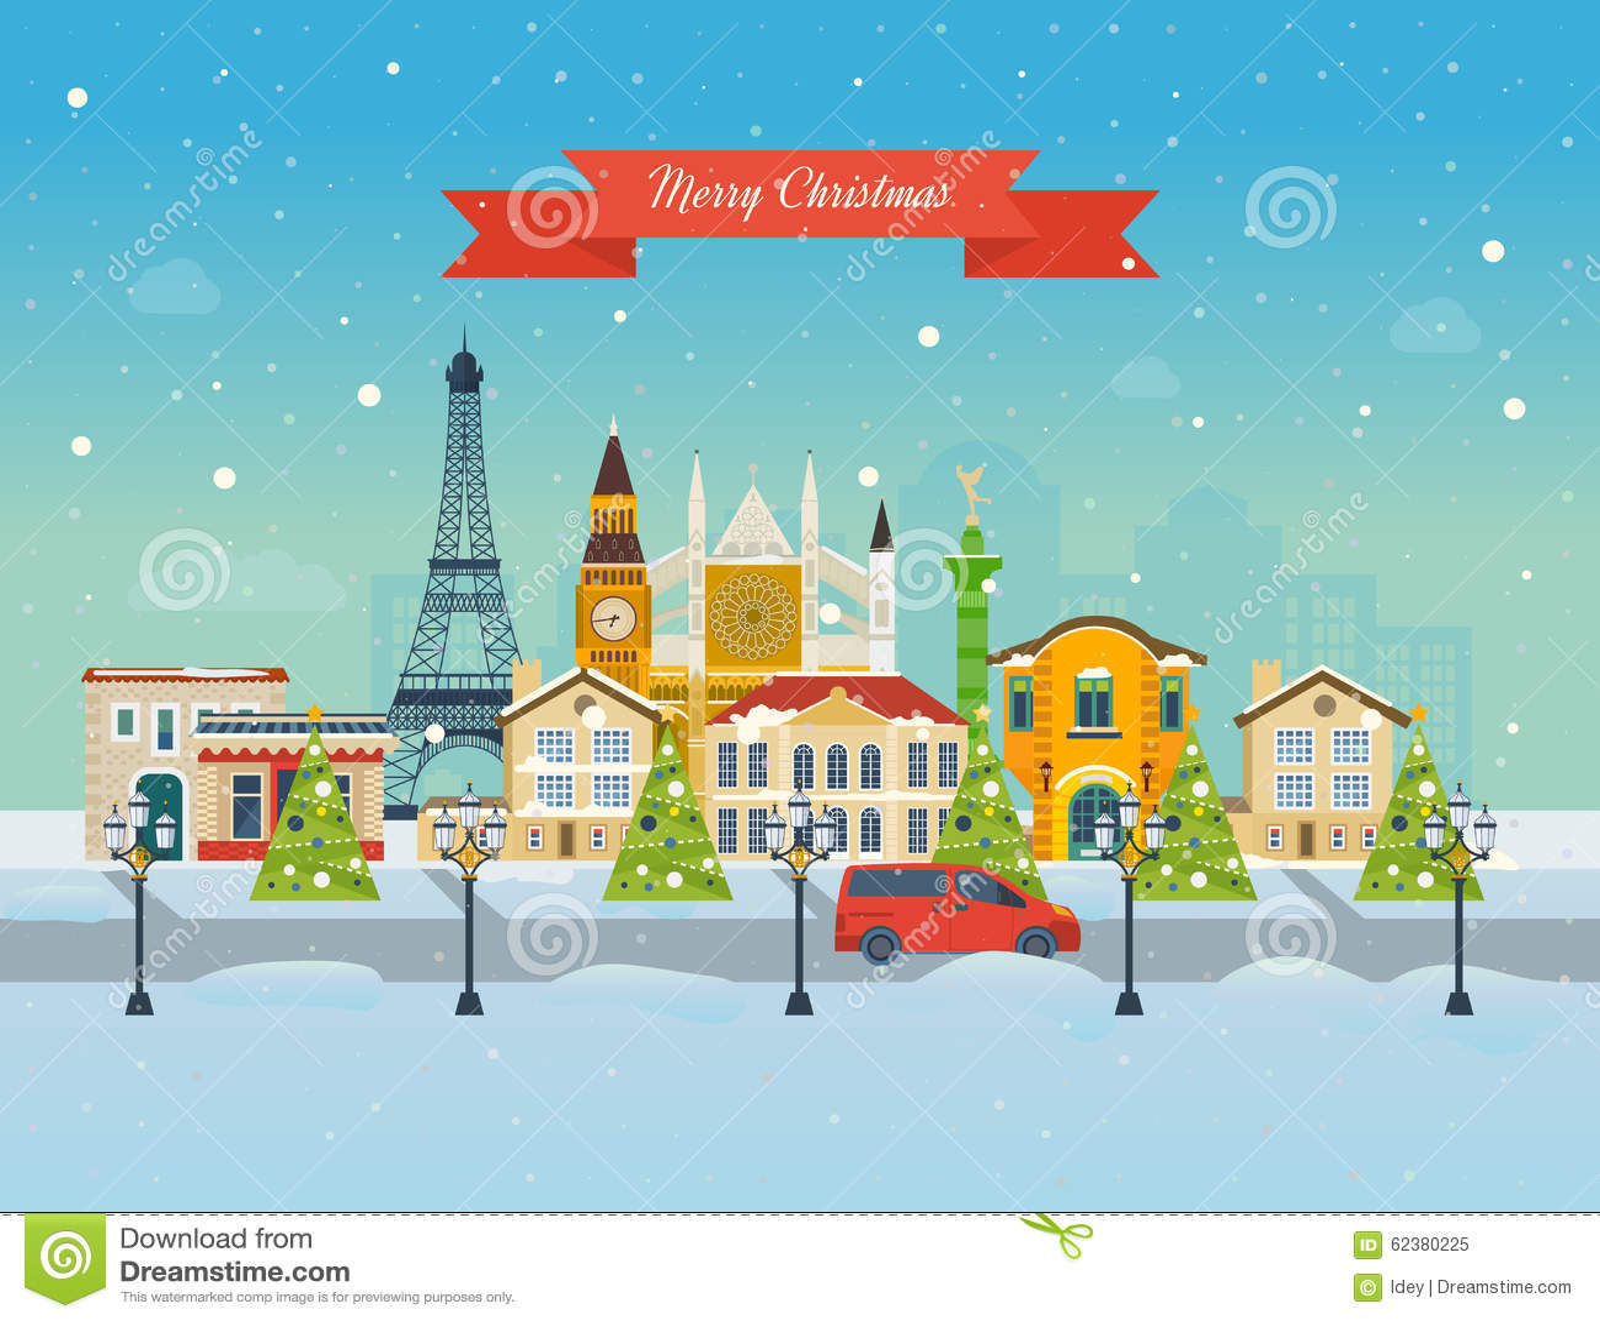 travel to europe for christmas  merry christmas stock